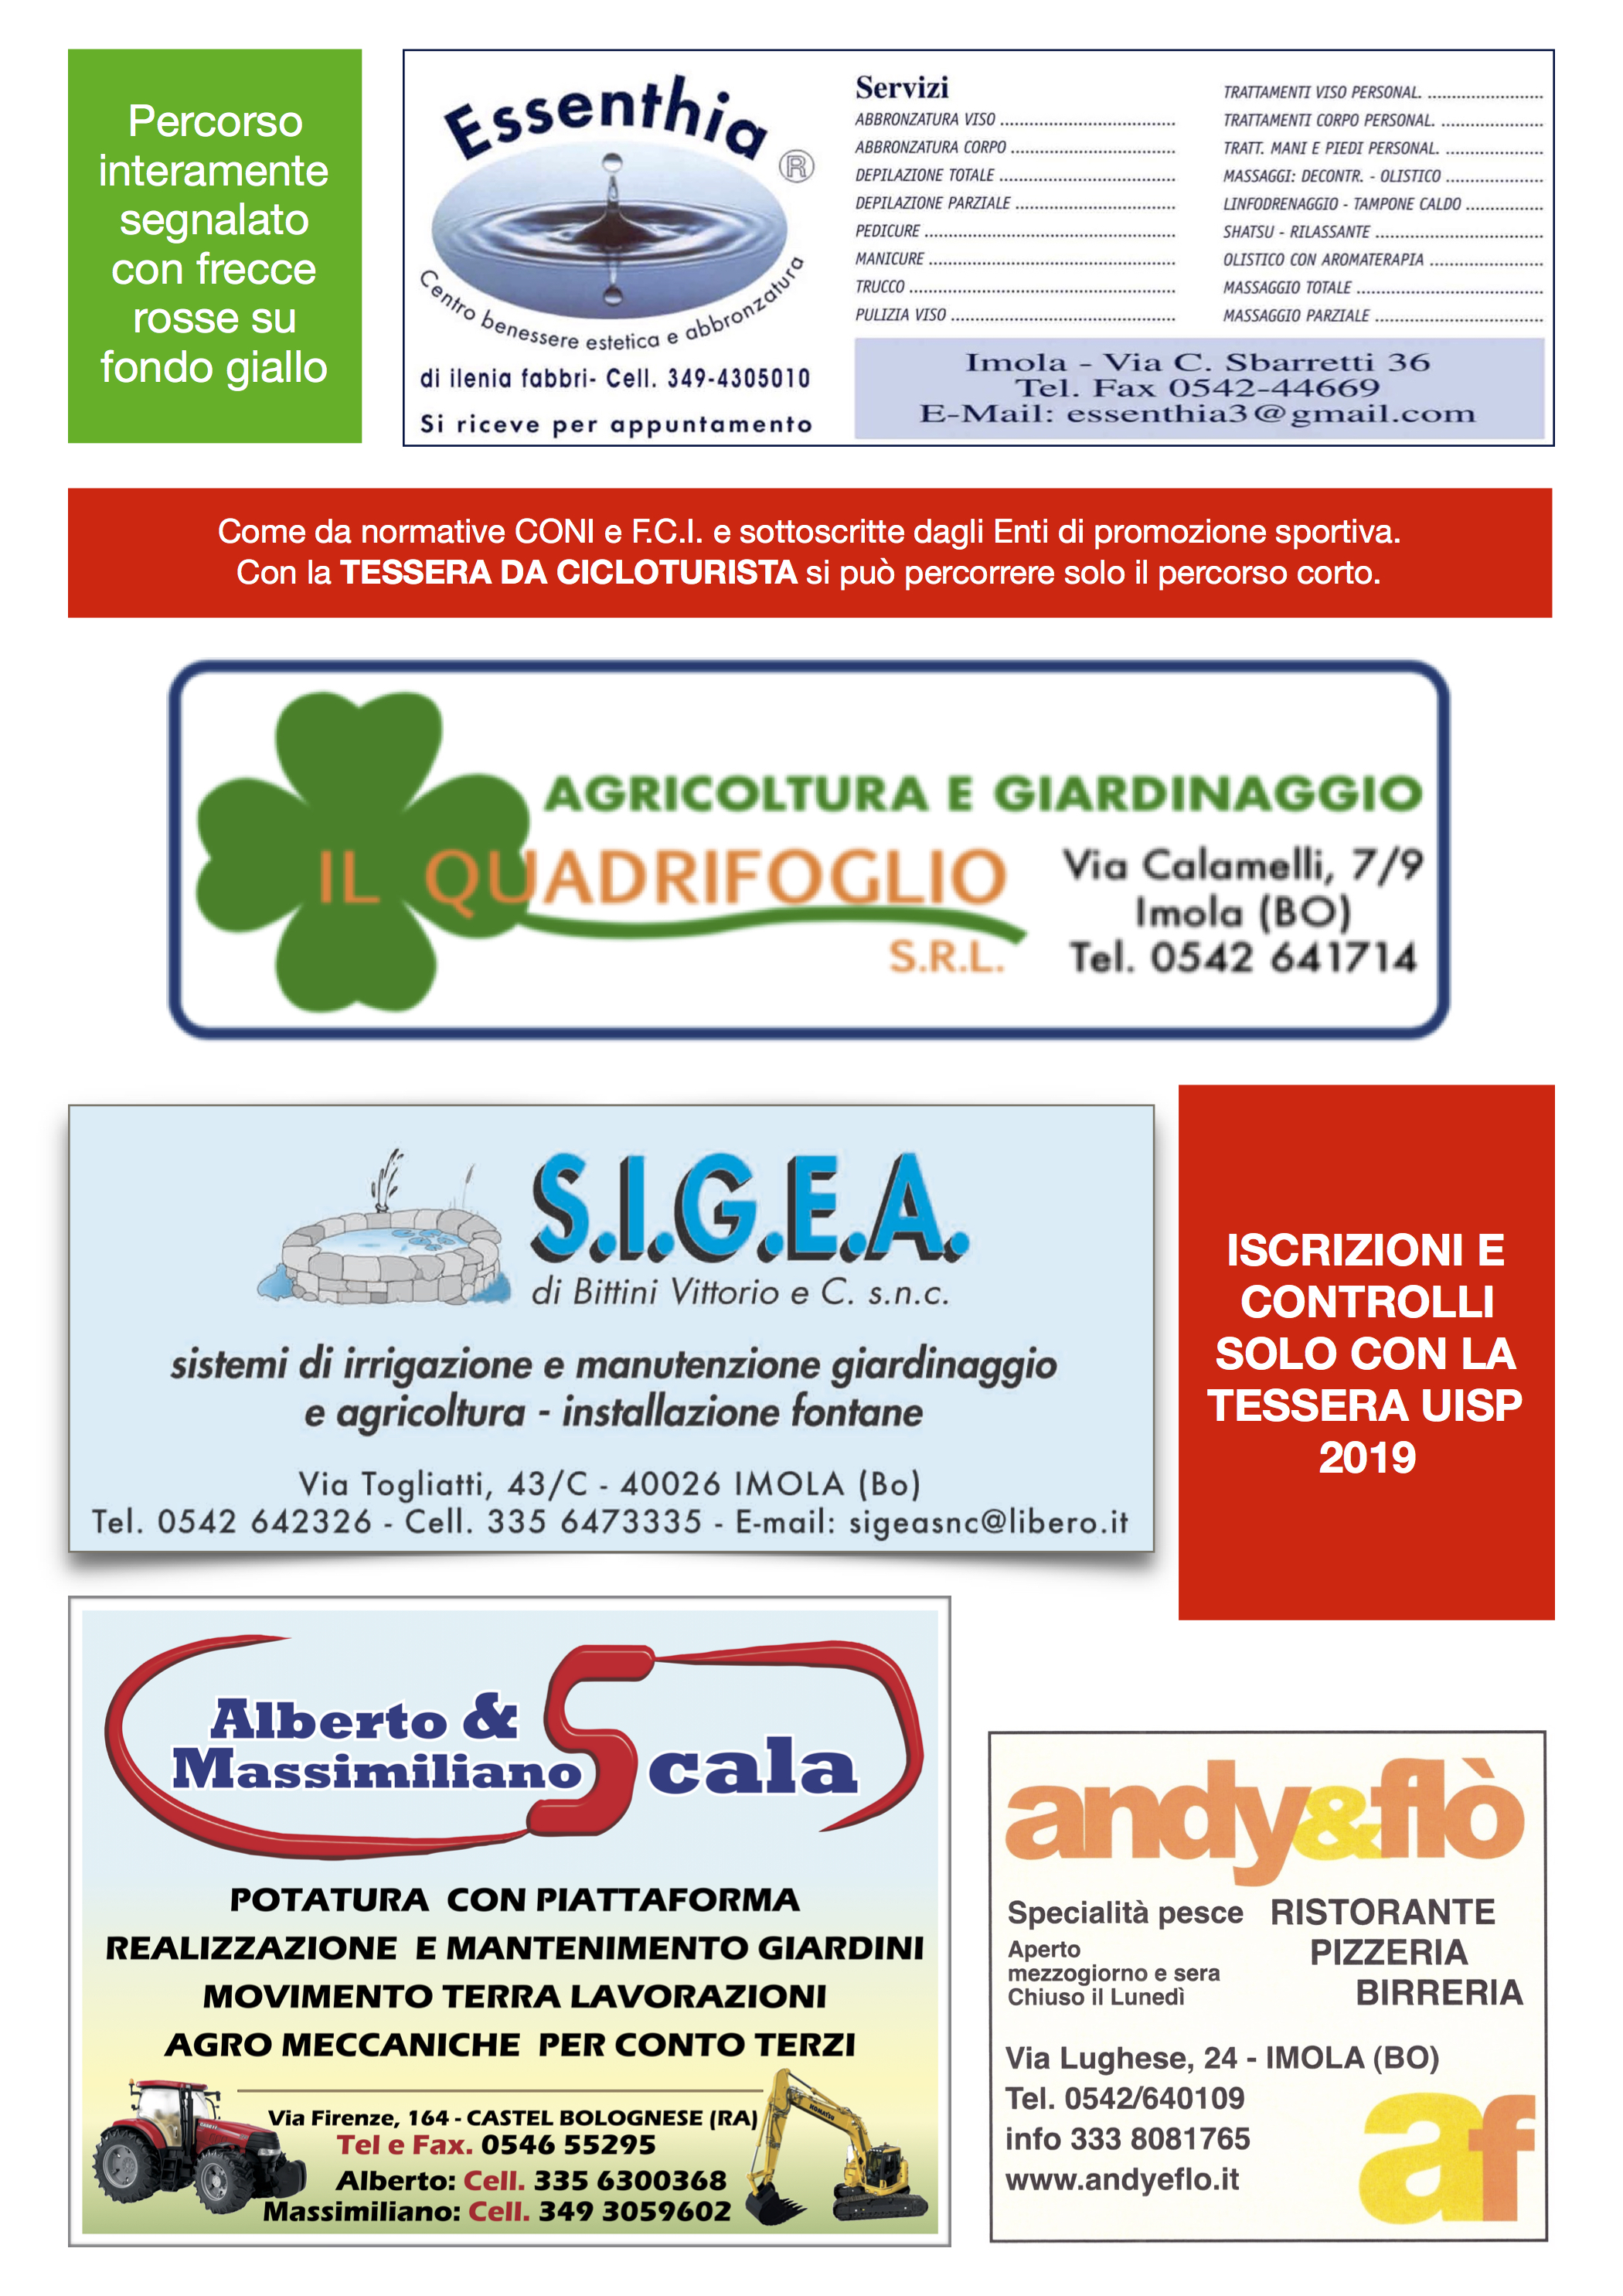 volantino-pubblicitario-raduno-nordpol-2019-pagina-5